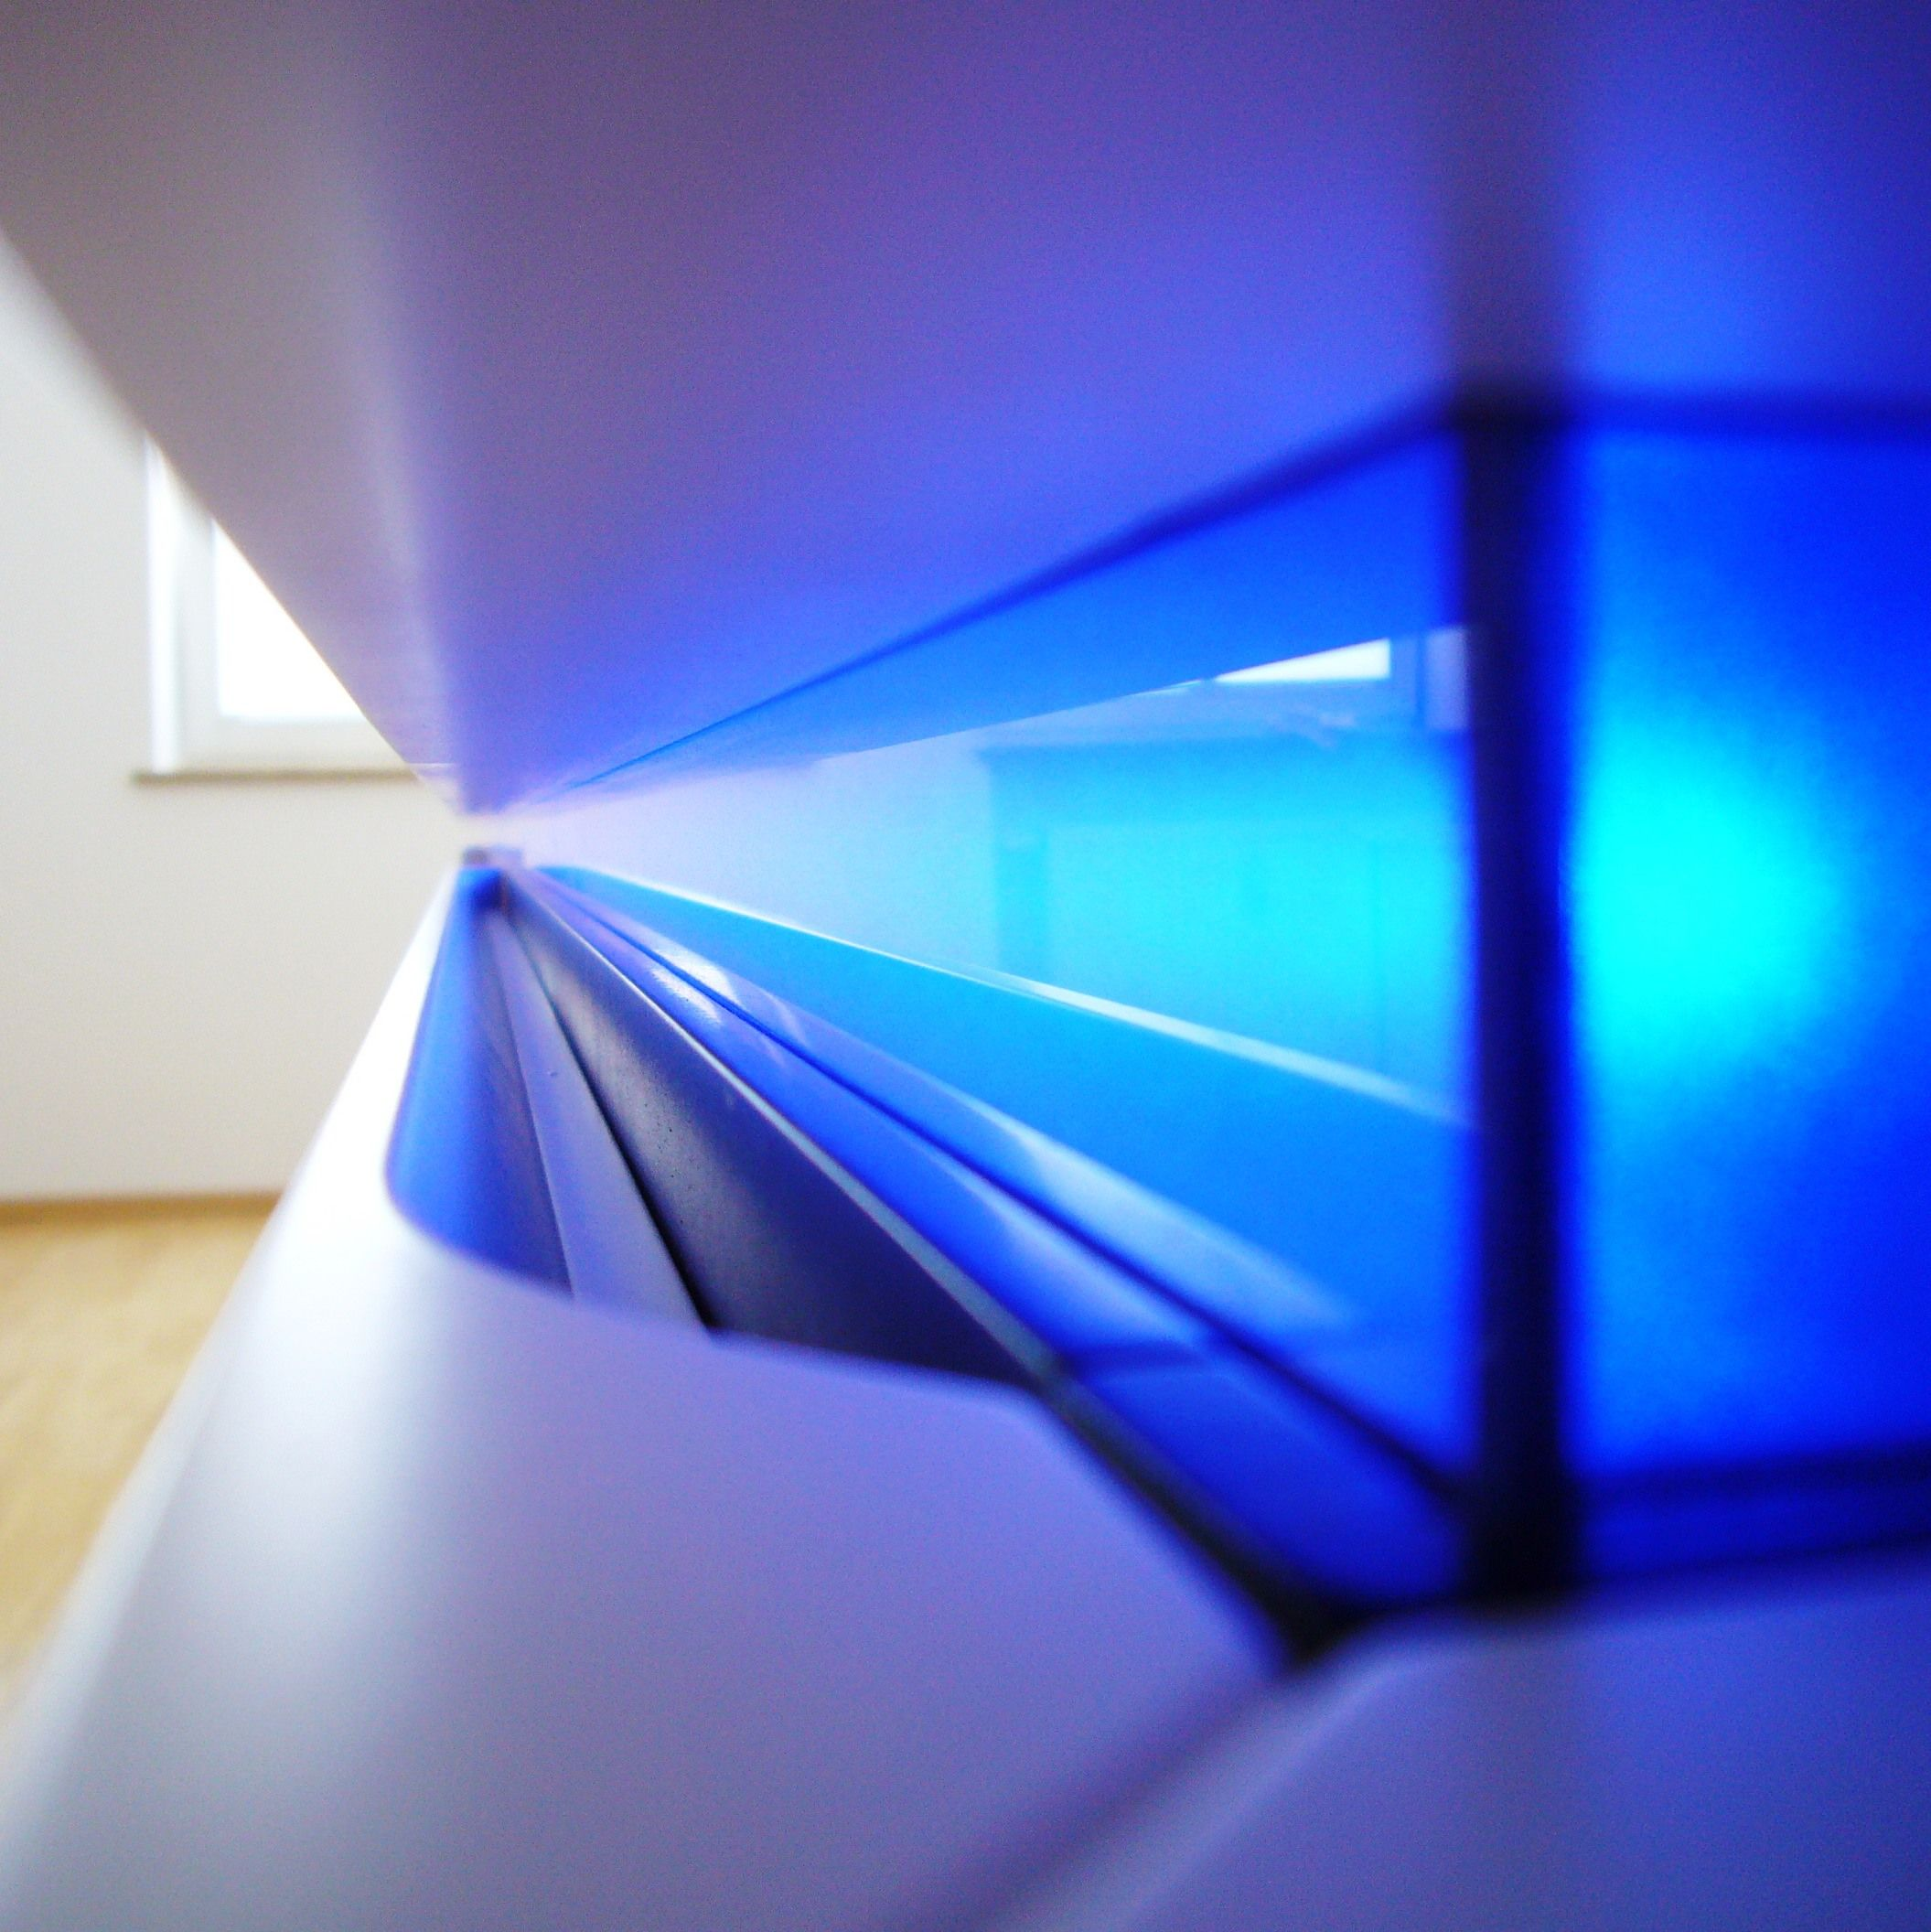 hifi m bel wei lackiert mit led beleuchtung durch blaues acrylglas l s sideboards. Black Bedroom Furniture Sets. Home Design Ideas